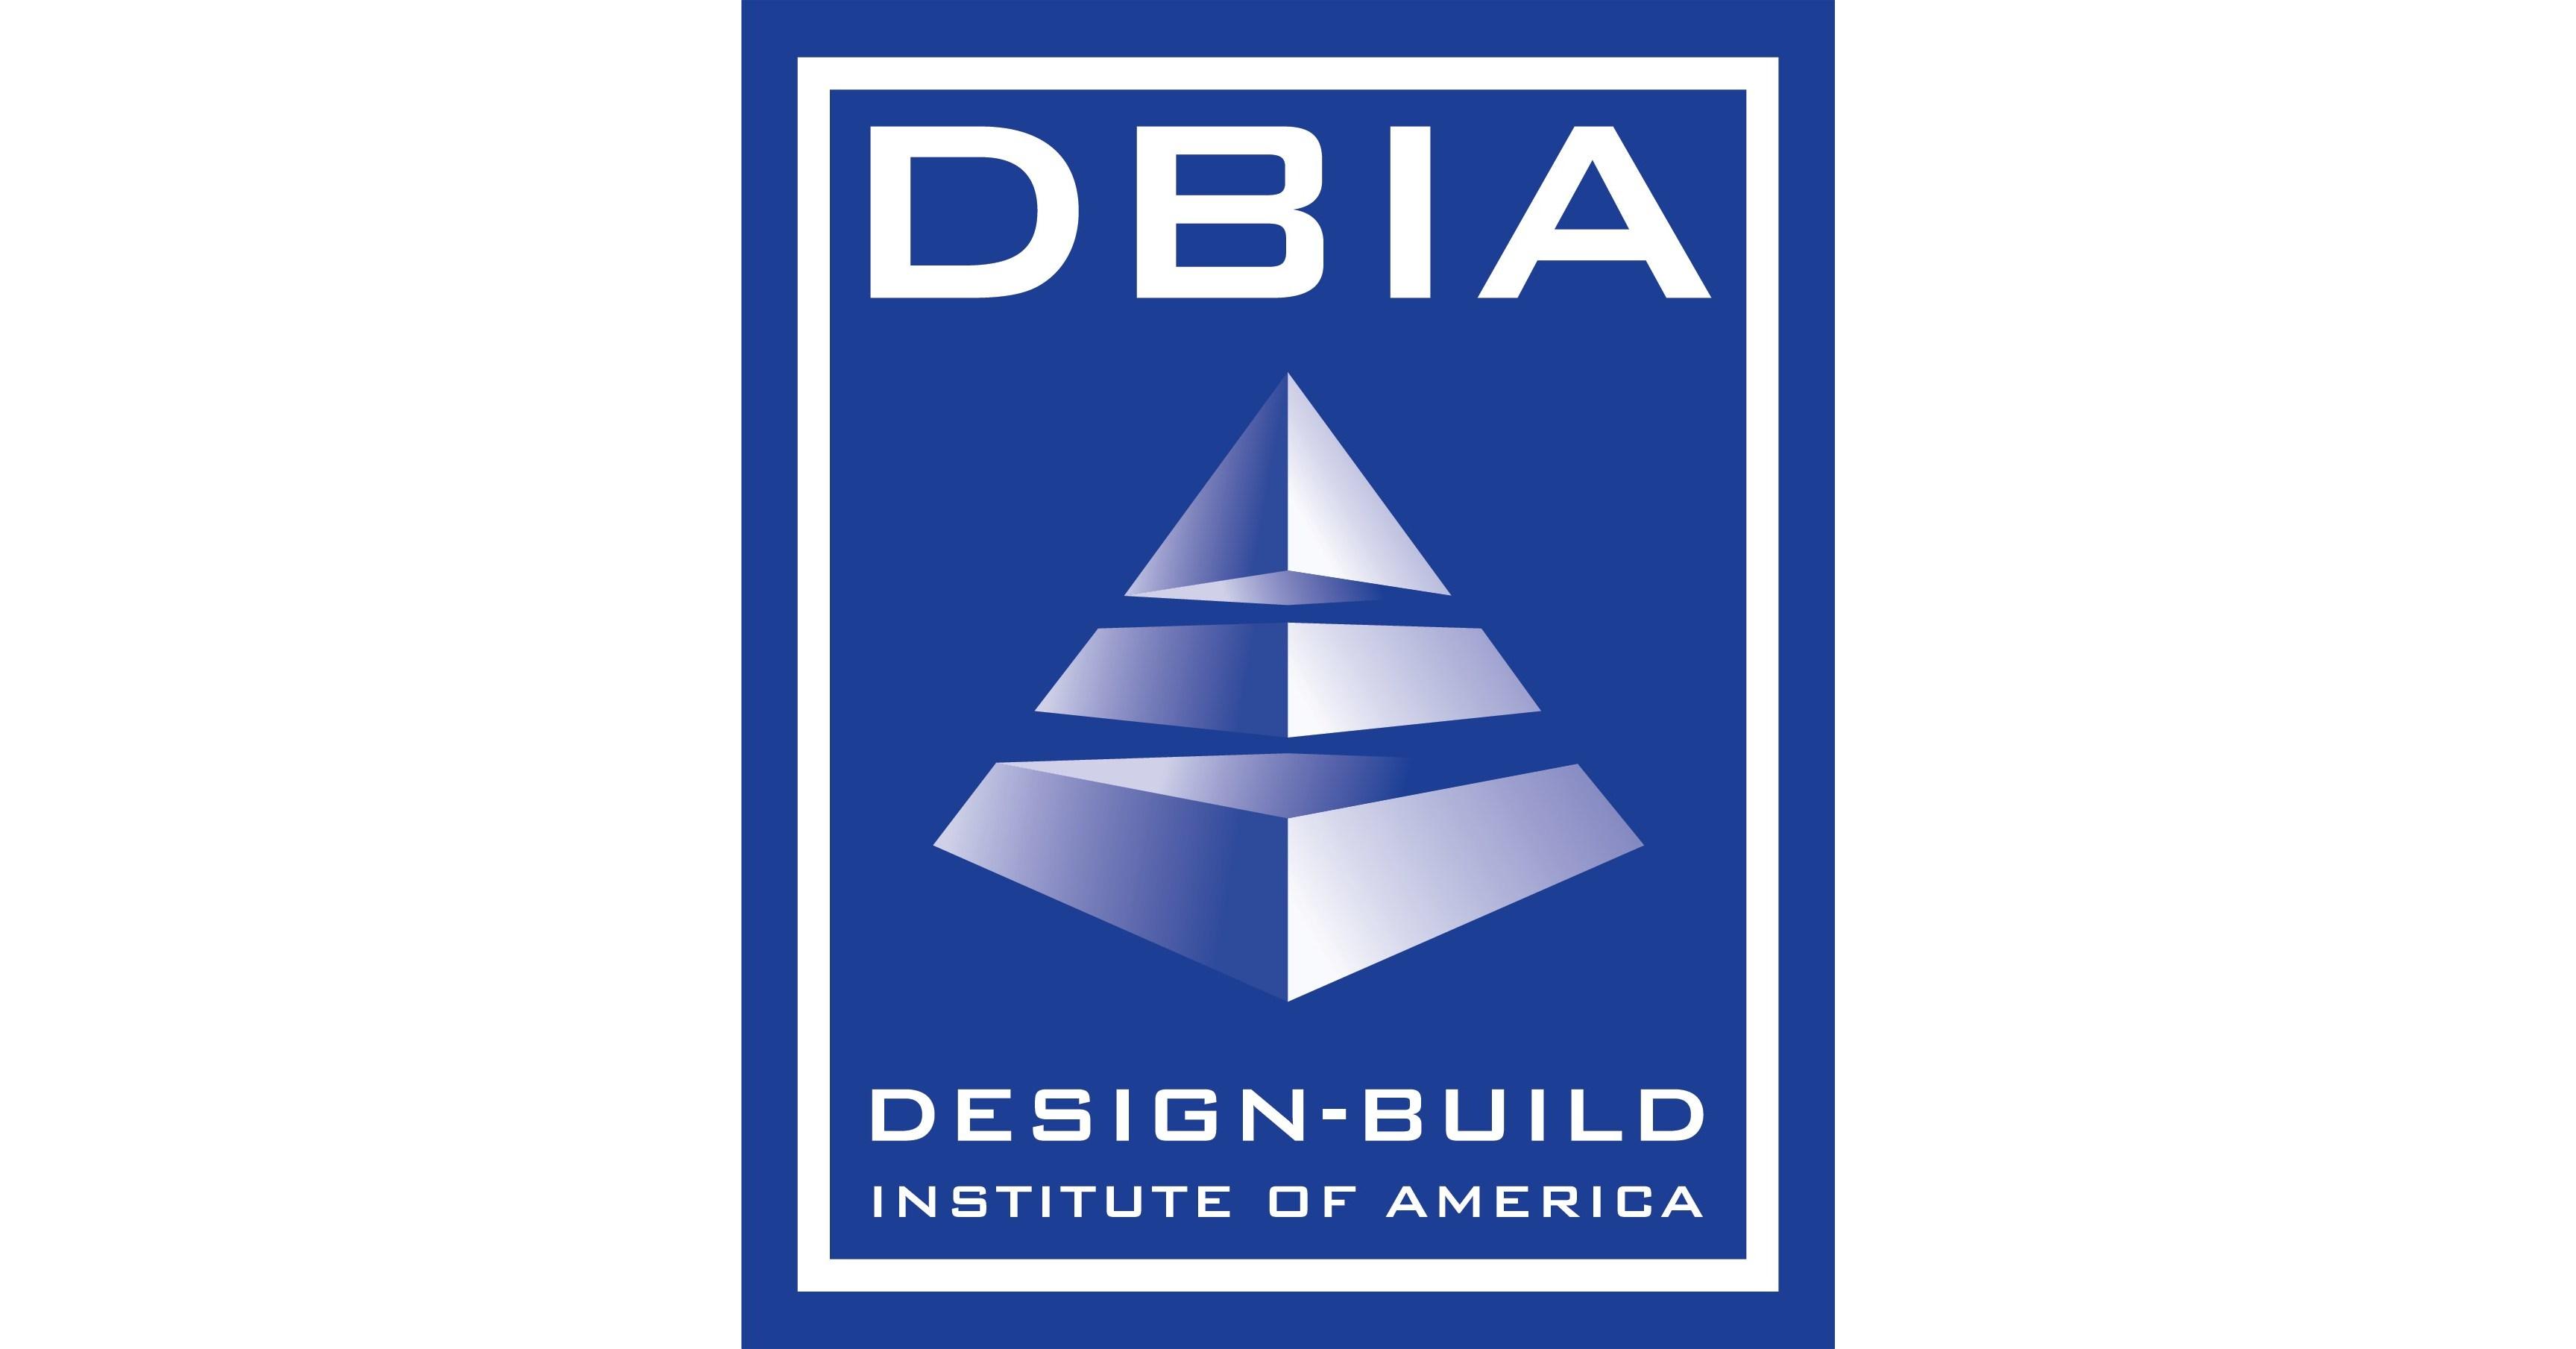 dbia build